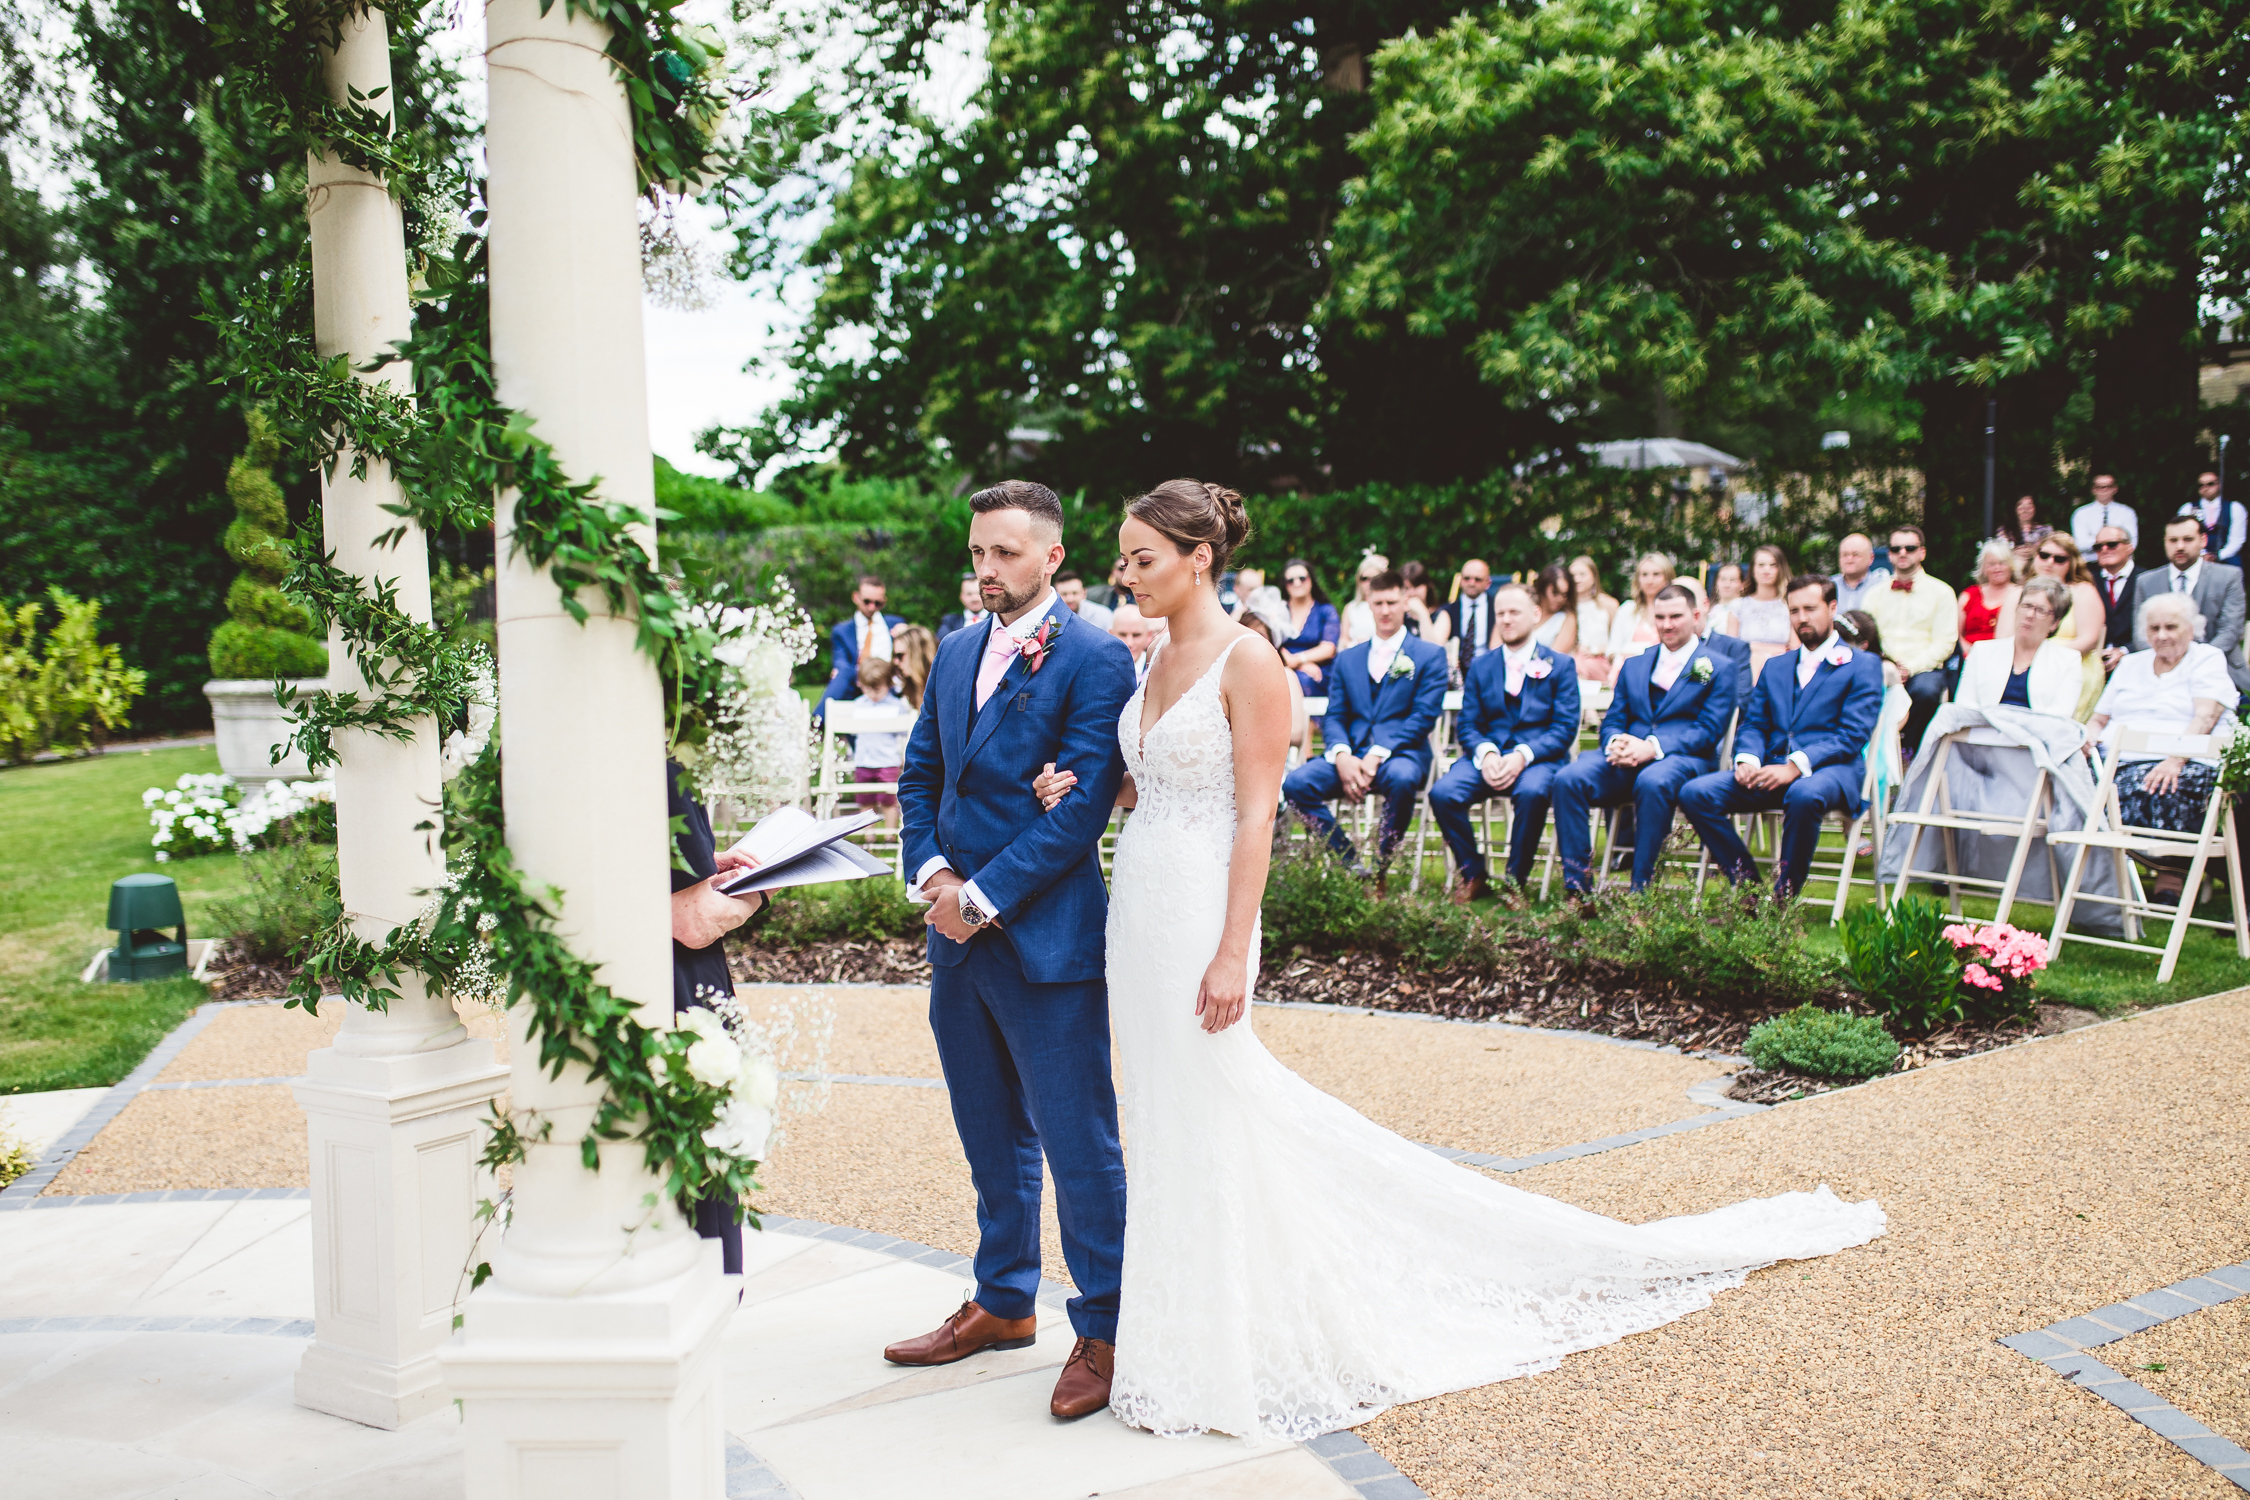 Tunbridge Wells Wedding Vilcinskaite Photo 31.jpg